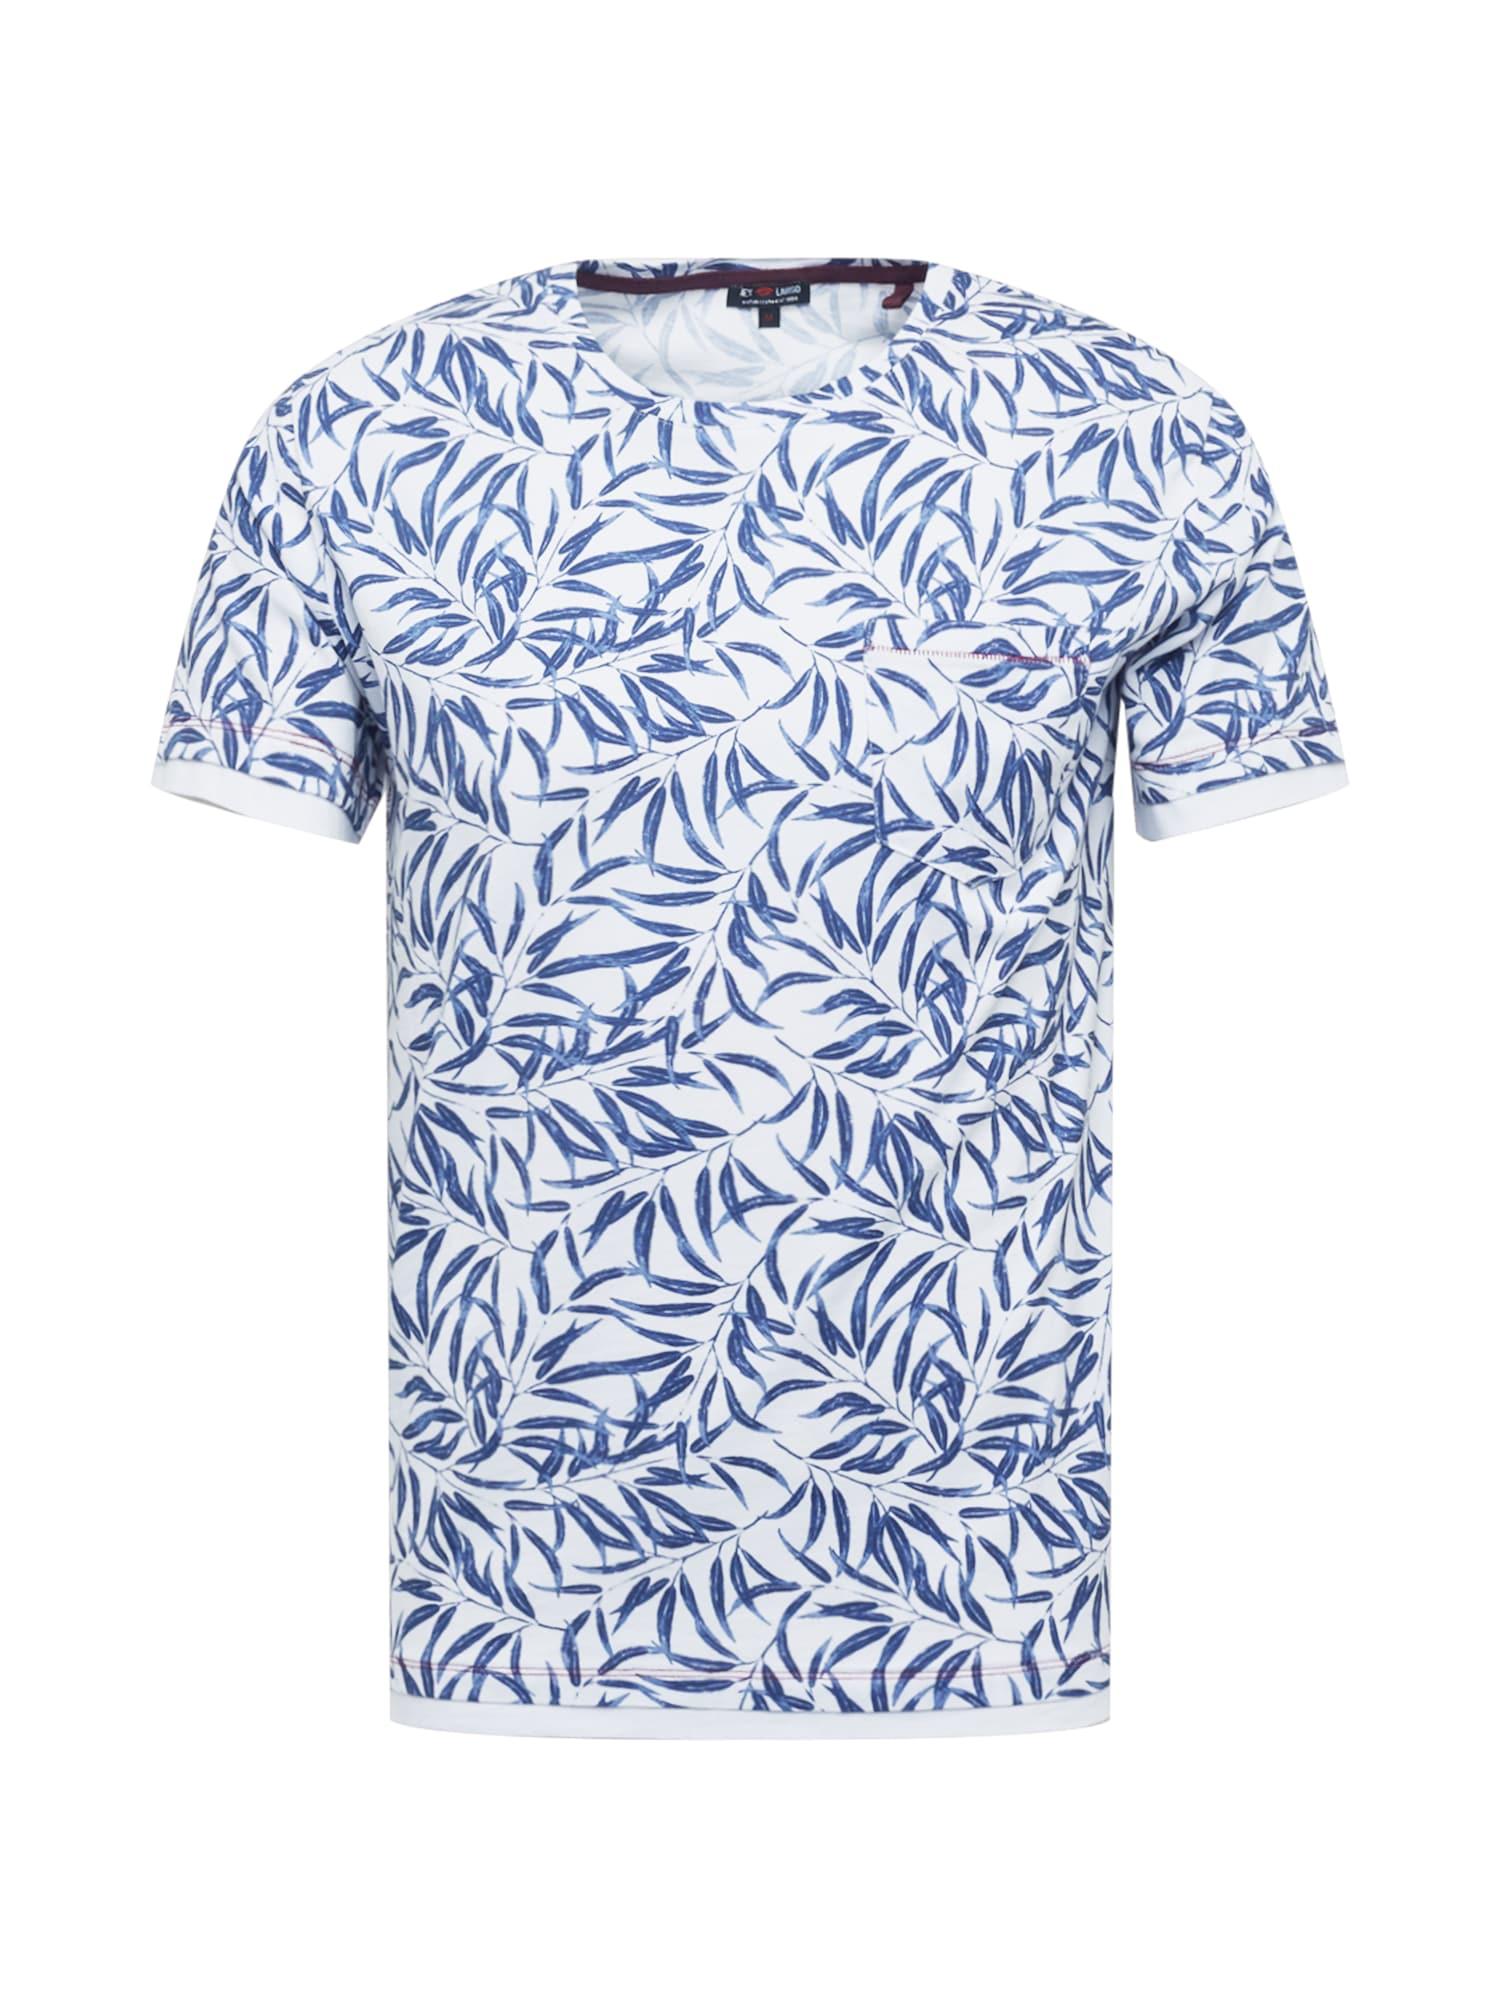 Key Largo T-Shirt 'LOCATION'  - Blanc, Bleu - Taille: XL - male